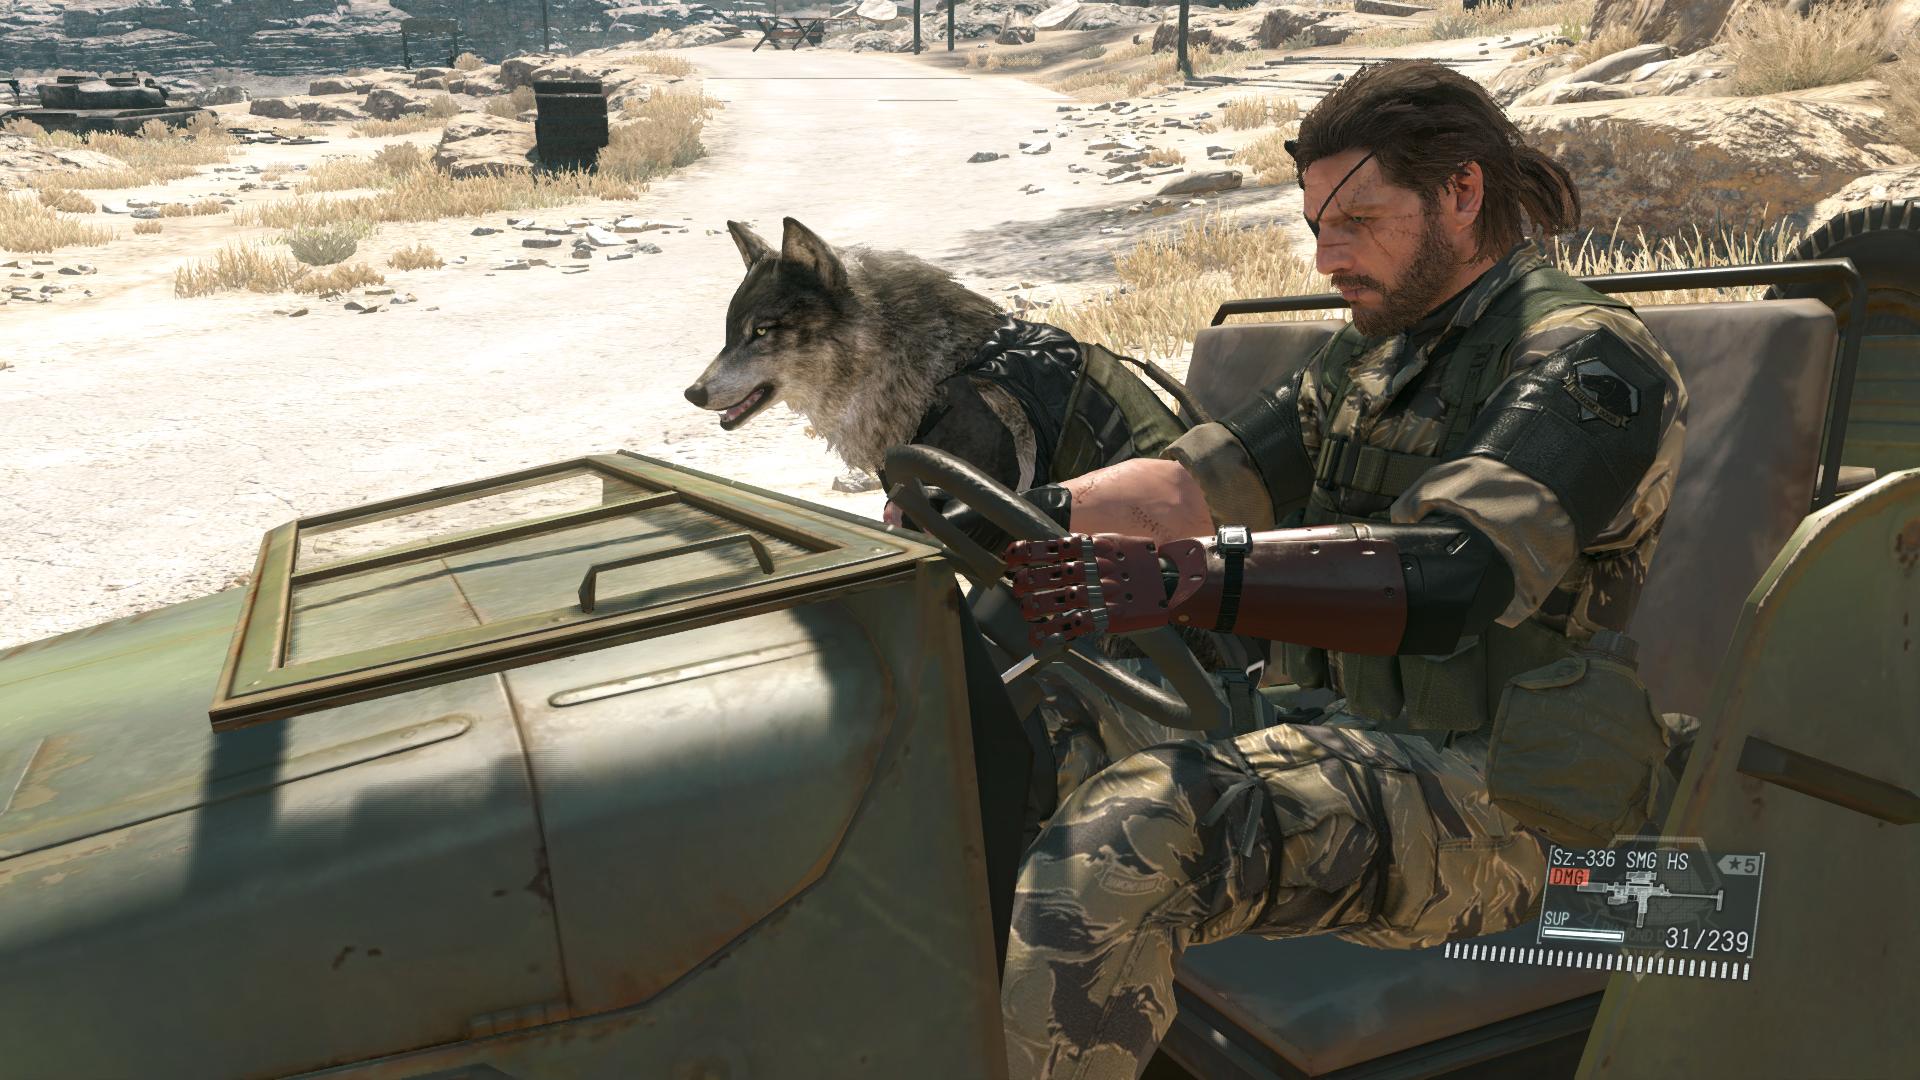 Metal Gear Solid V The Phantom Pain ESPAÑOL Descargar Full (CPY) + REPACK 5 DVD5 (JPW) 5